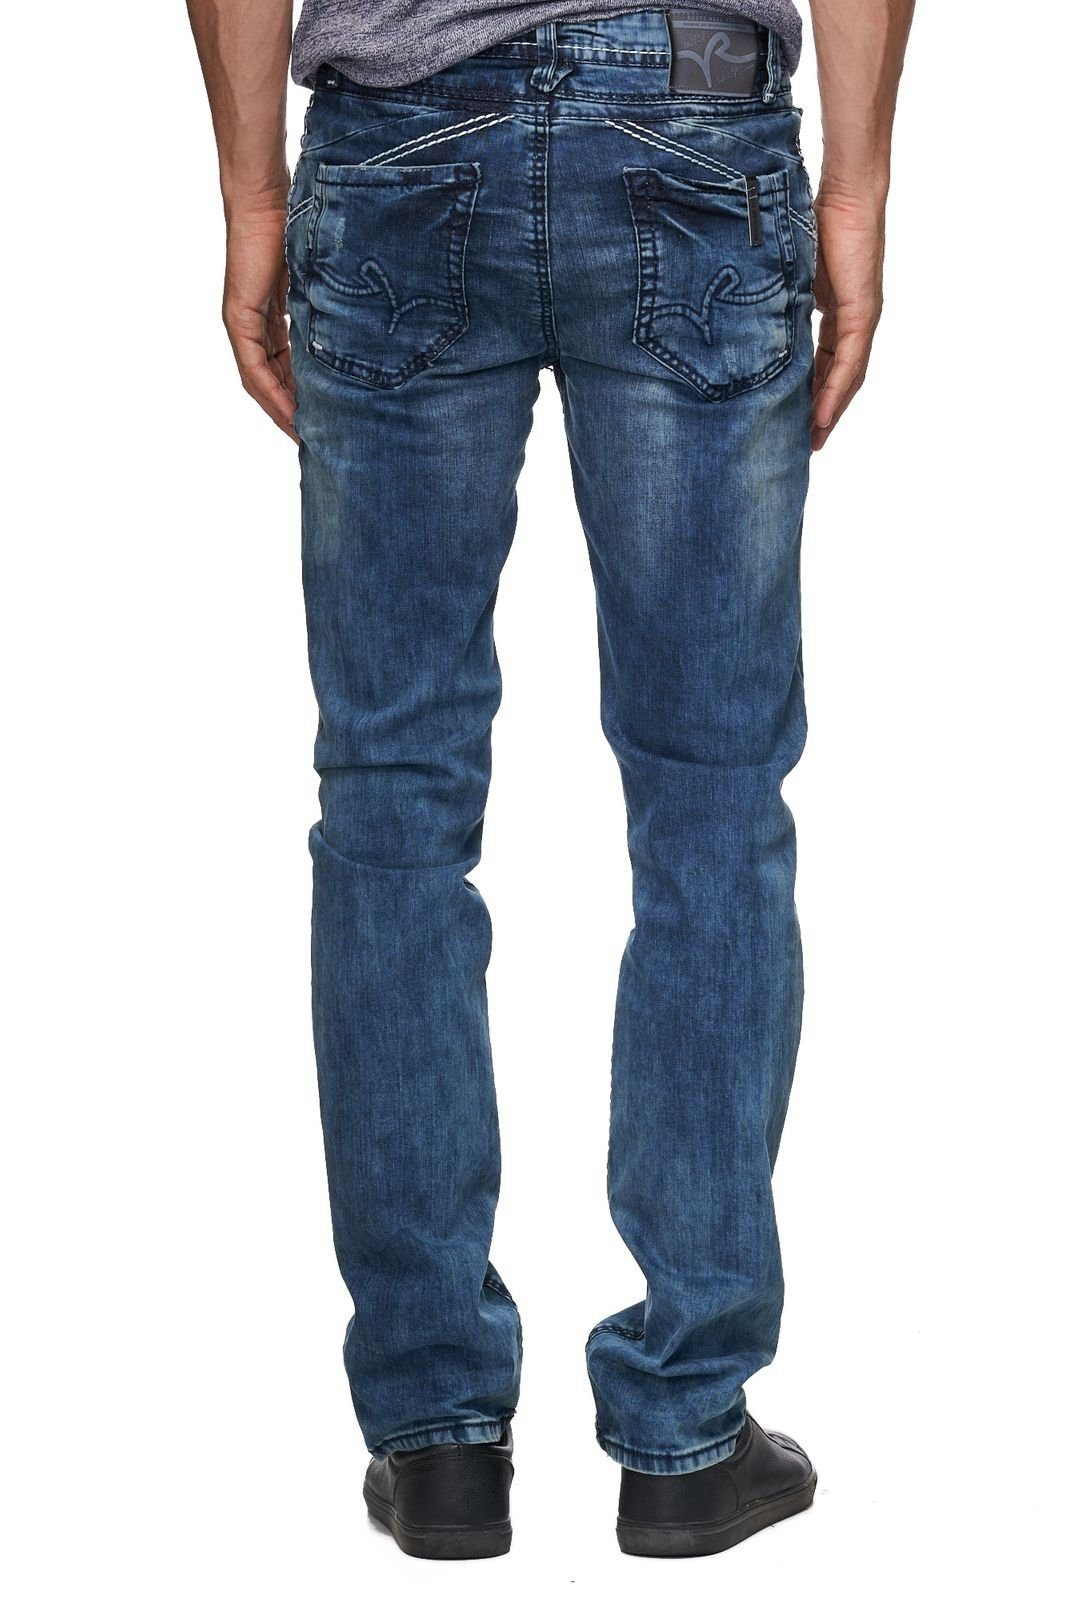 Rusty Neal Jeanshose in klassischem Design, Herren Jeans der Marke Rusty Neal online kaufen   OTTO